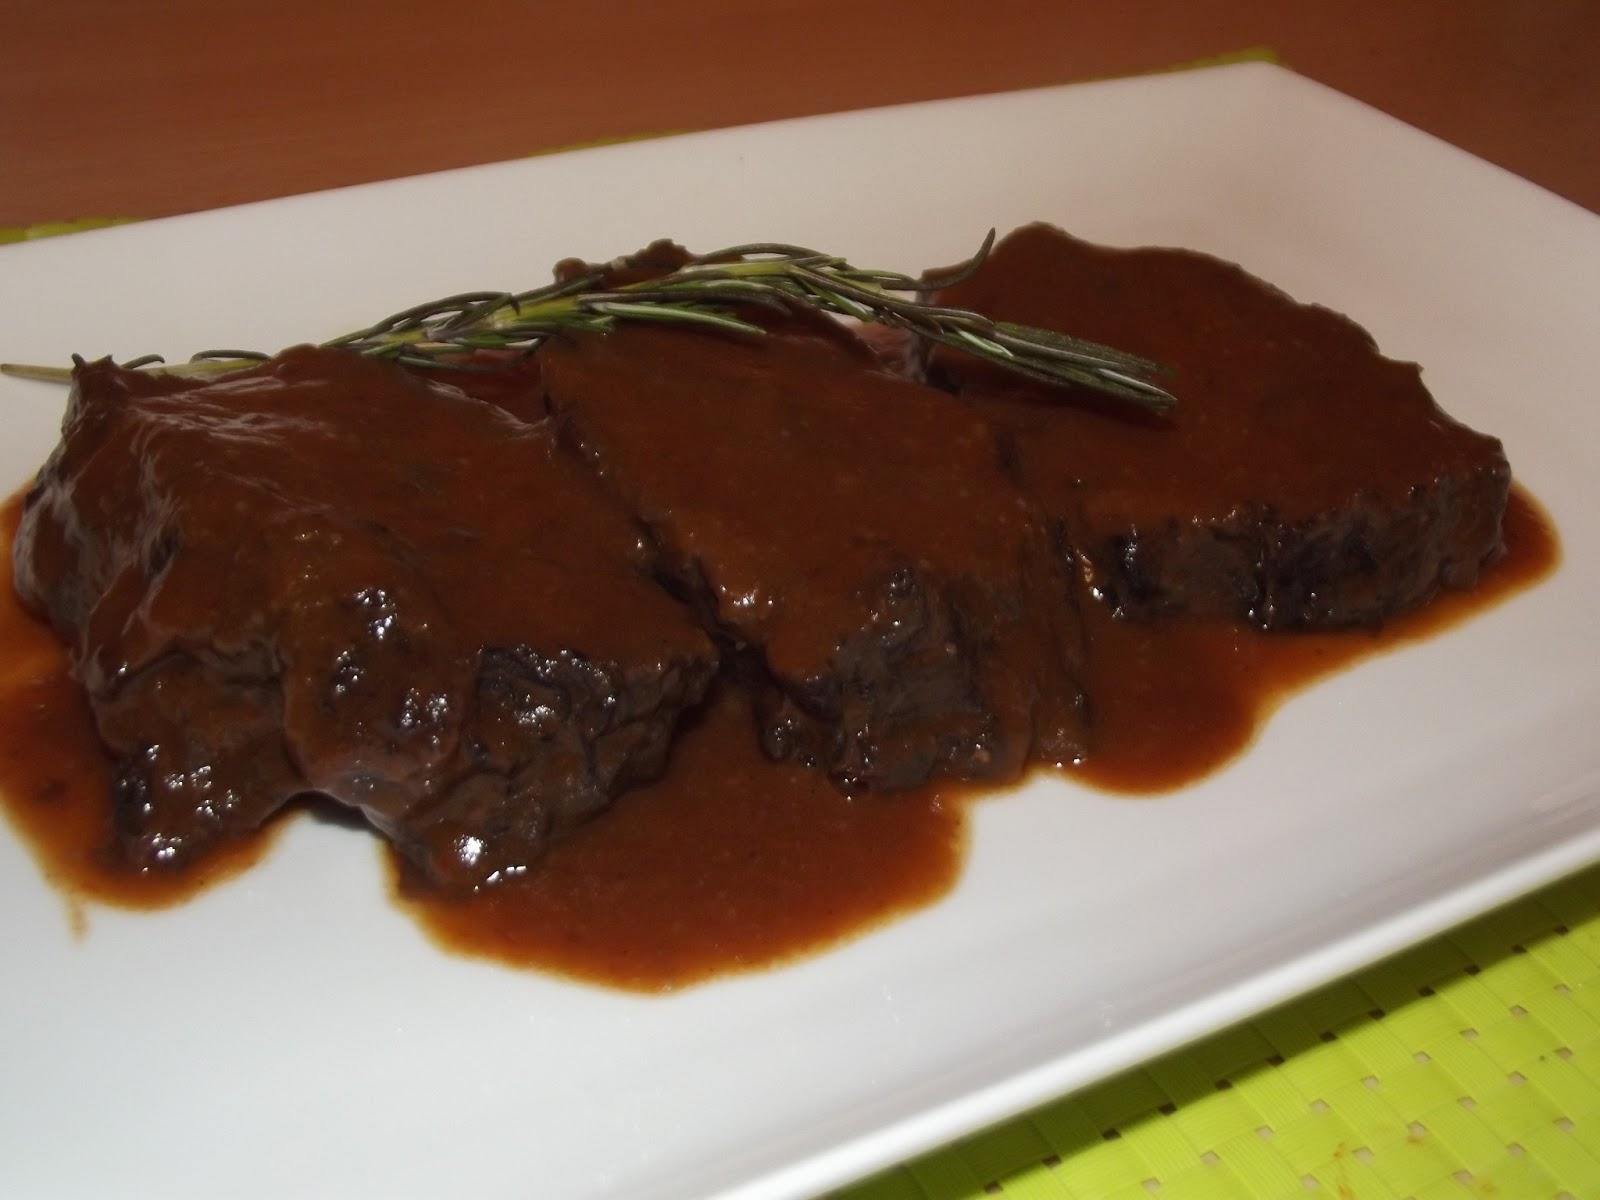 Carrilleras De Ternera En Salsa De Vino Tinto - Que-son-las-carrilleras-de-ternera